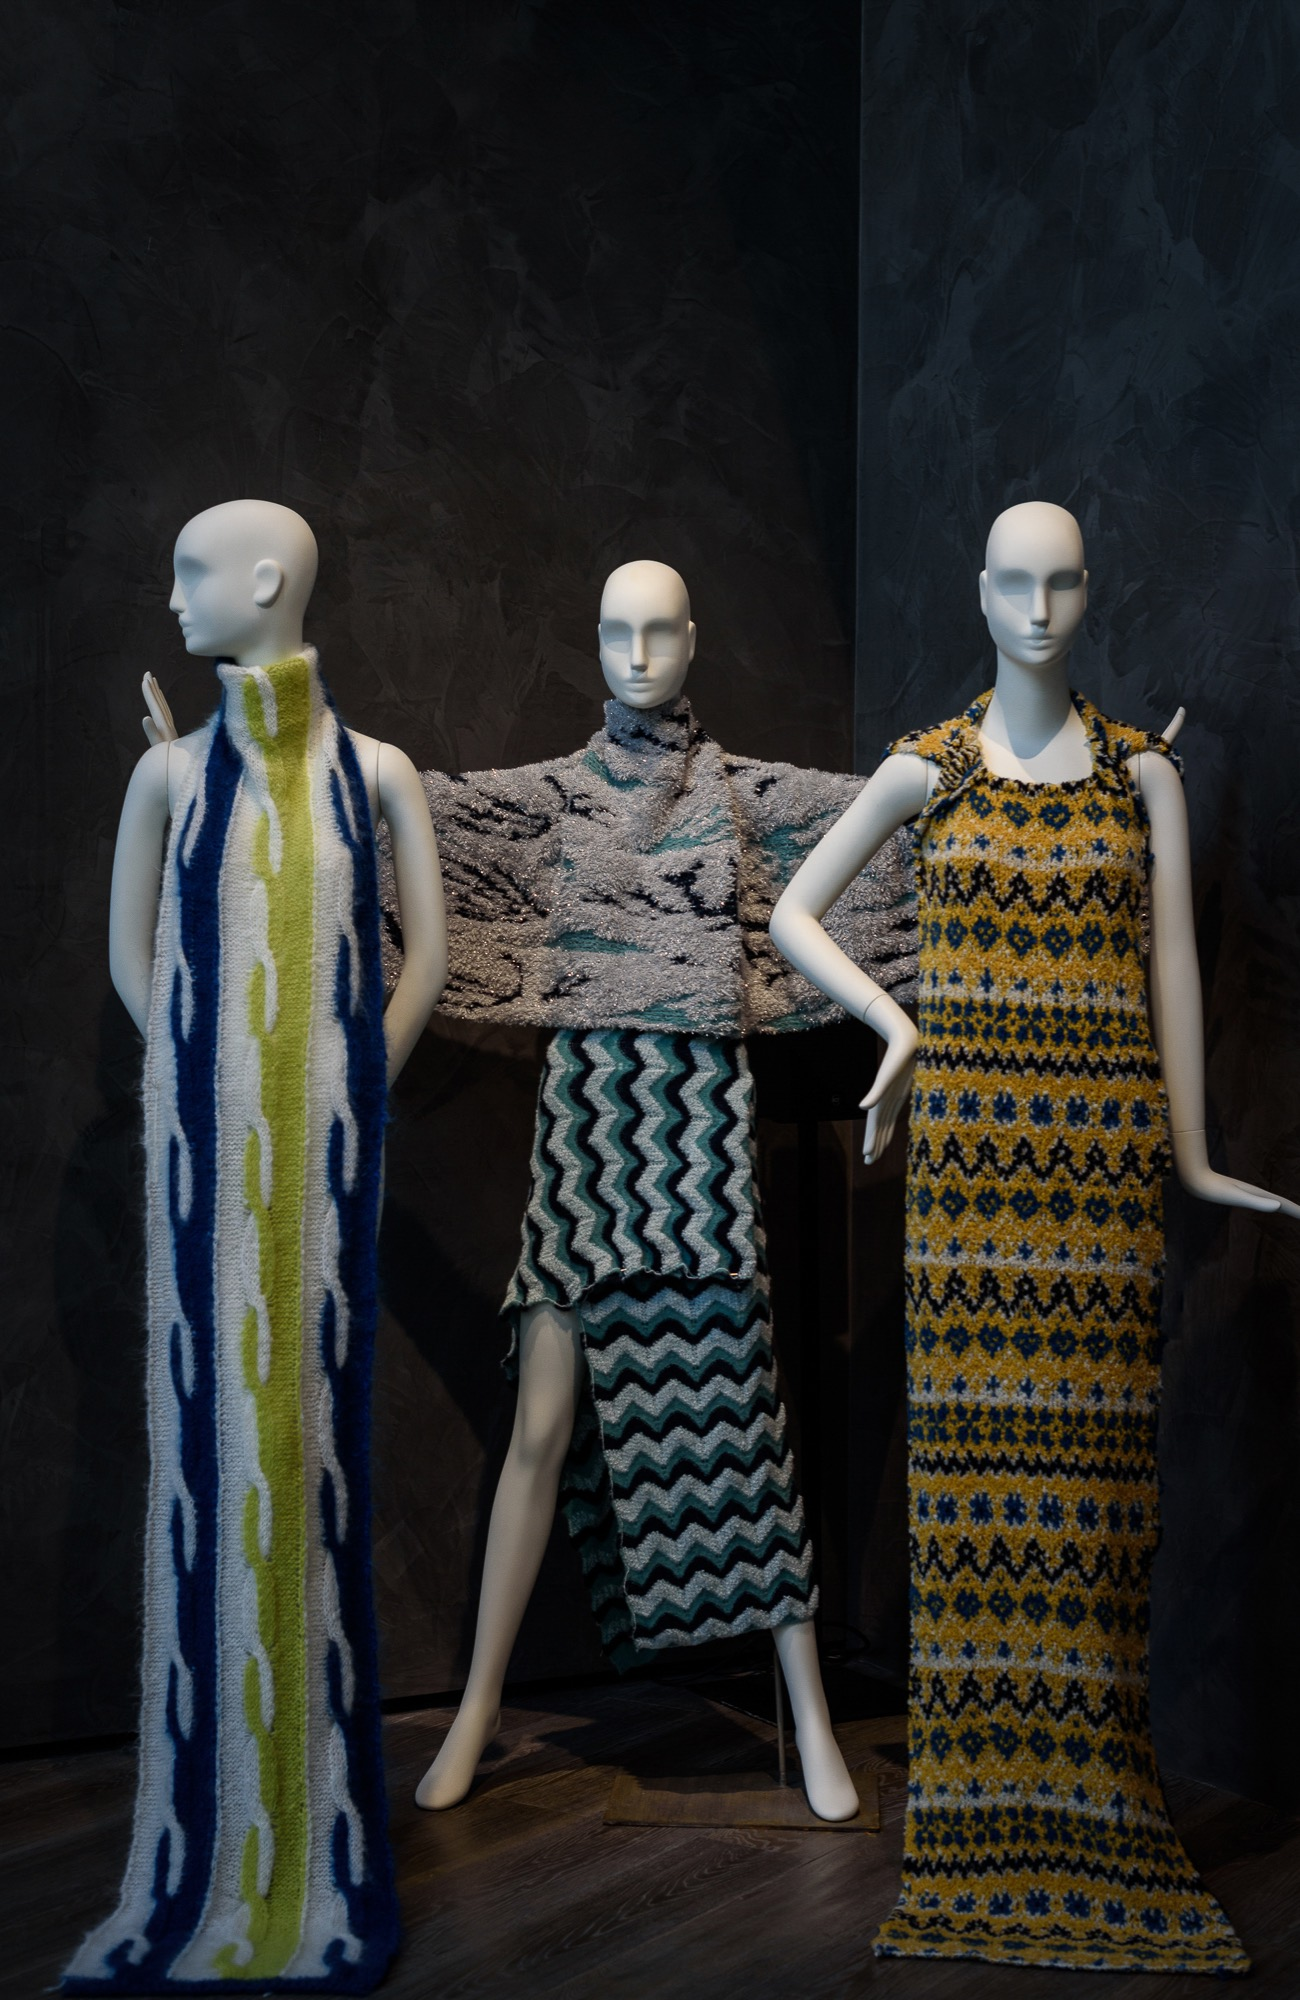 Schläppi 2200 female mannequins for Linea Piu exhibition